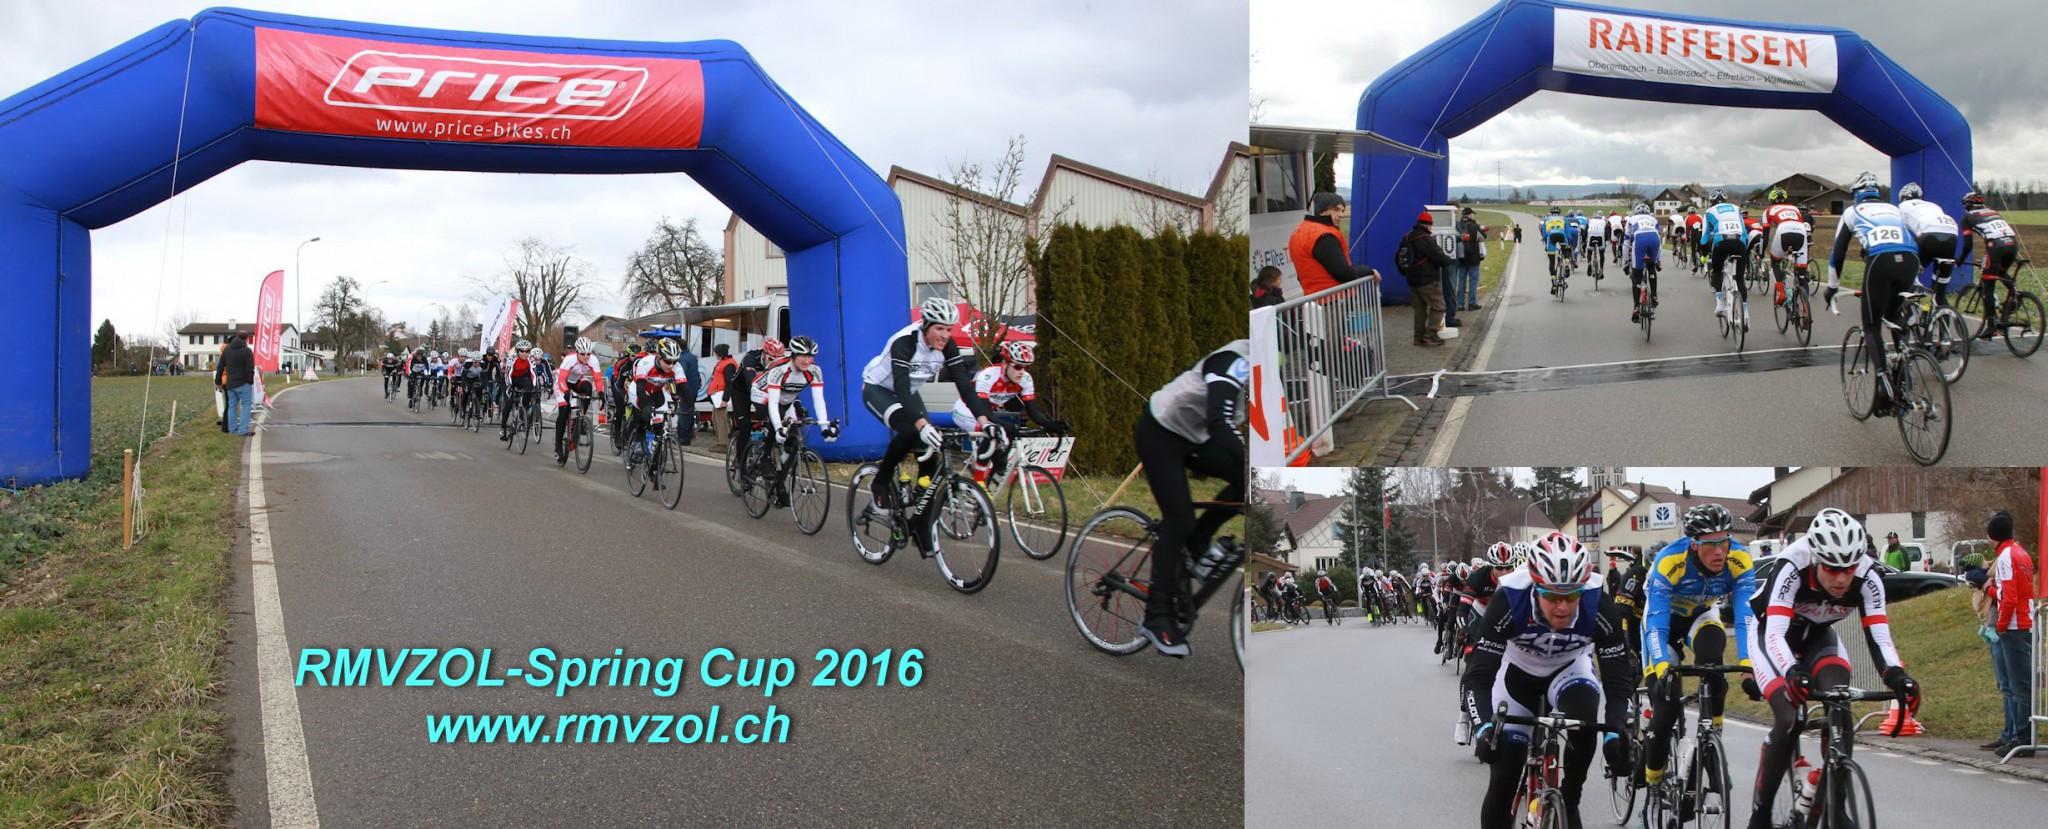 RMVZOLSpringCup2016